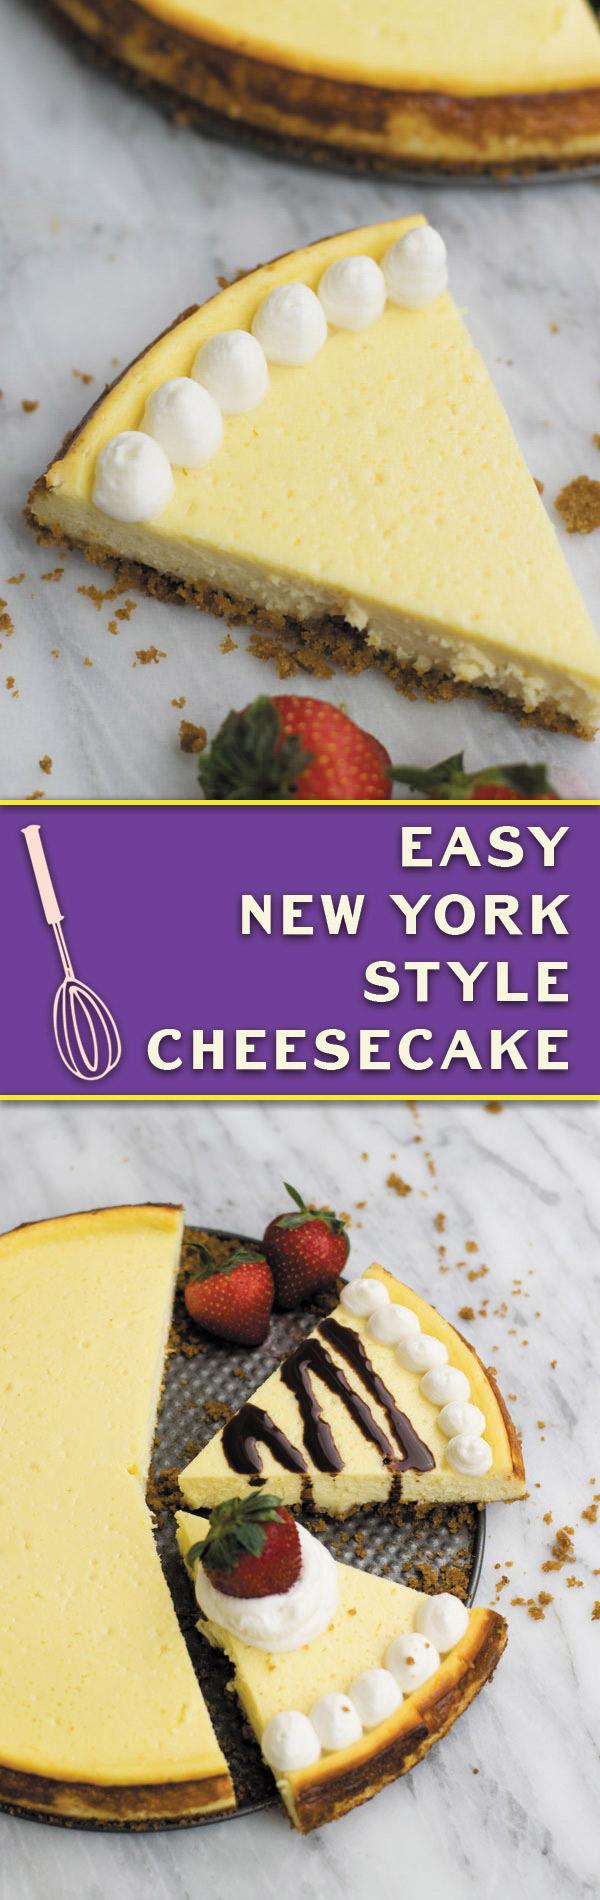 easy-new-york-style-cheesecake-recipe-pinterest